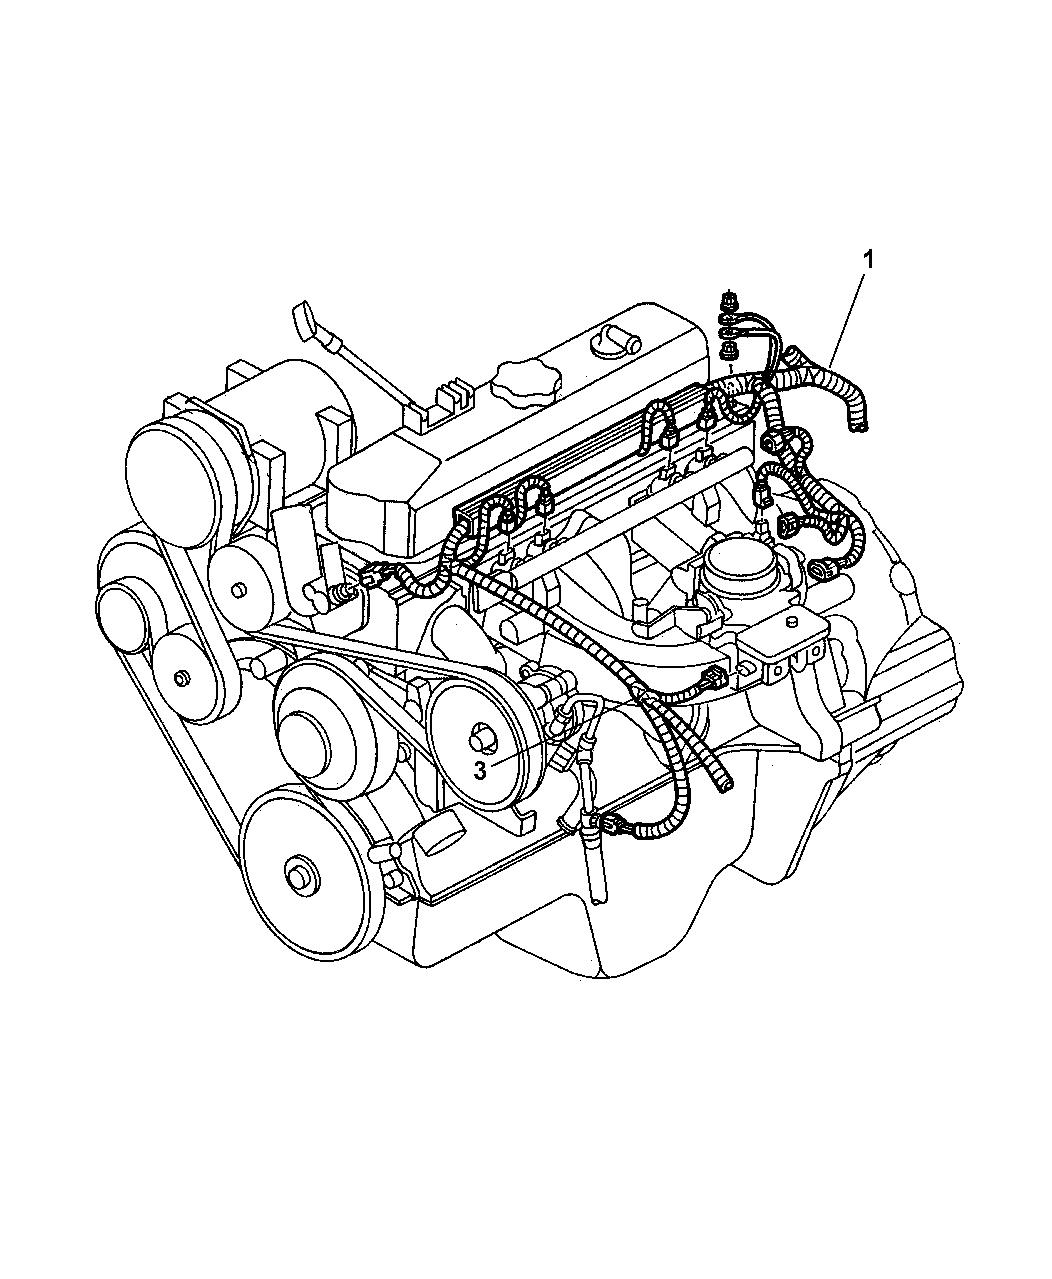 Dodge Dakota Wiring Diagram on 90 dodge dakota engine, 89 dodge dakota wiring diagram, 91 dodge dakota wiring diagram, 90 dodge dakota parts,